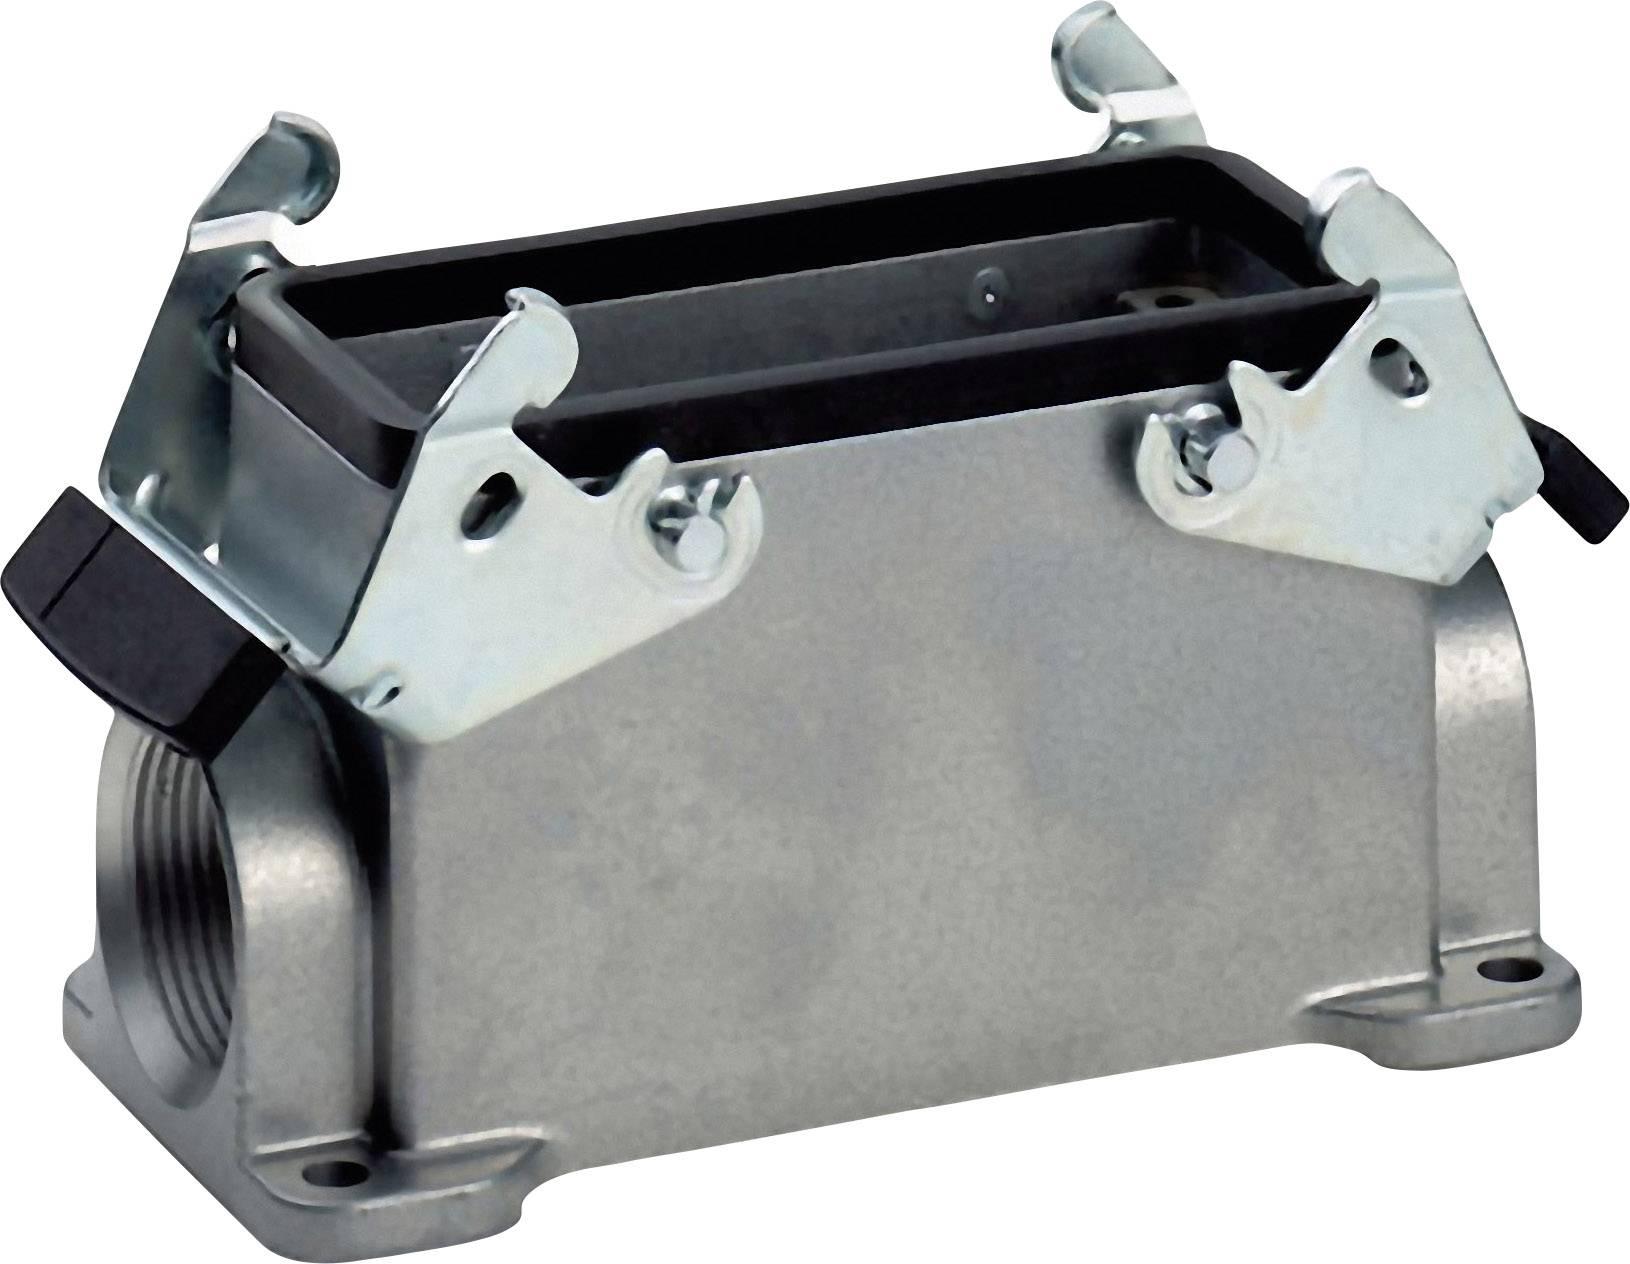 LappKabel EPIC® H-B 10 SGR M25 ZW (19034100), IP65, šedá